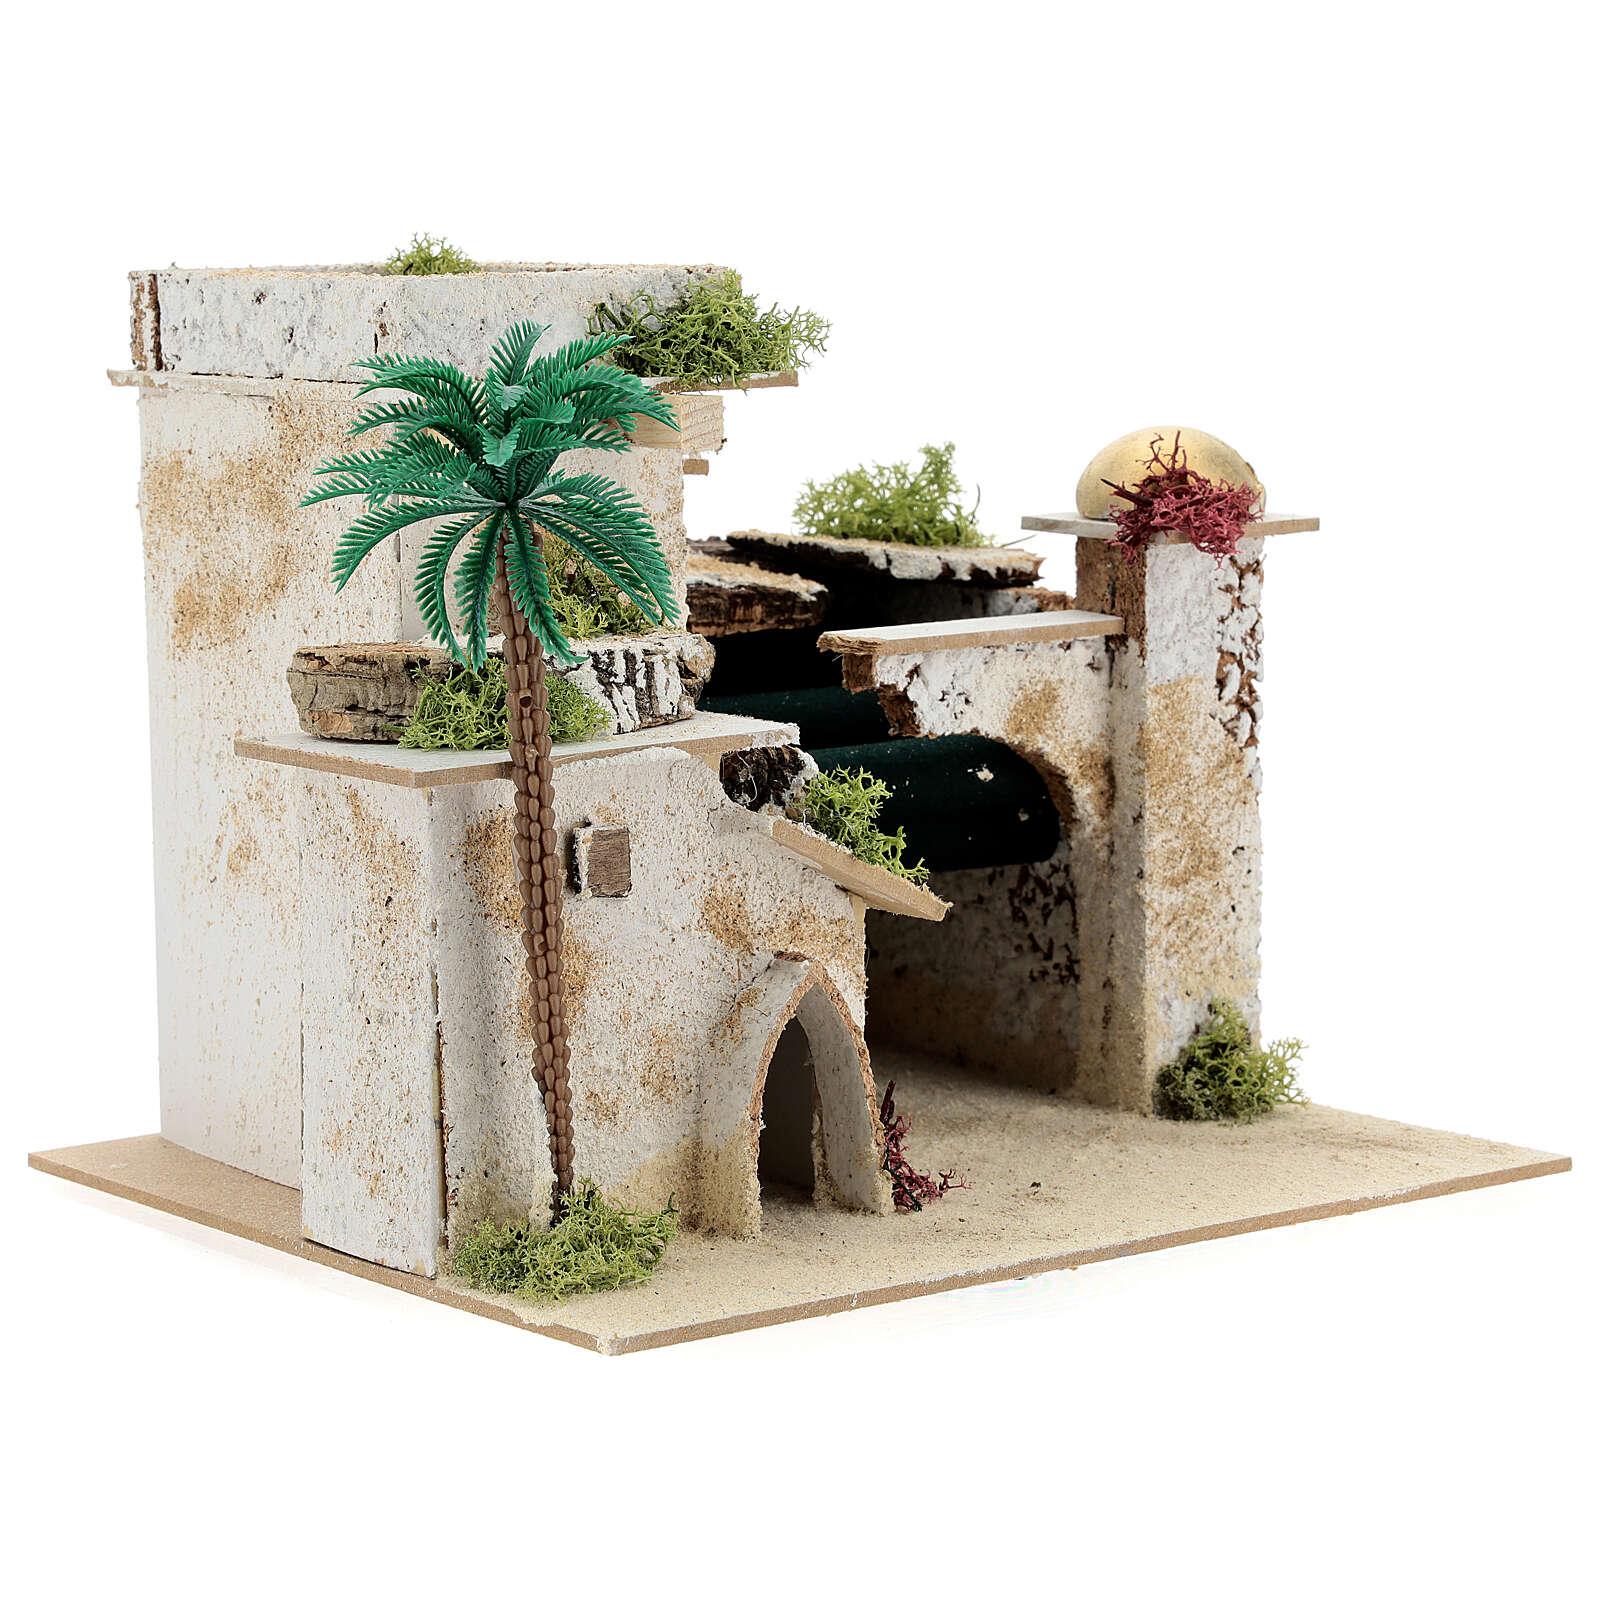 Casa en estilo árabe con palma y porche 20x25x20 cm 4